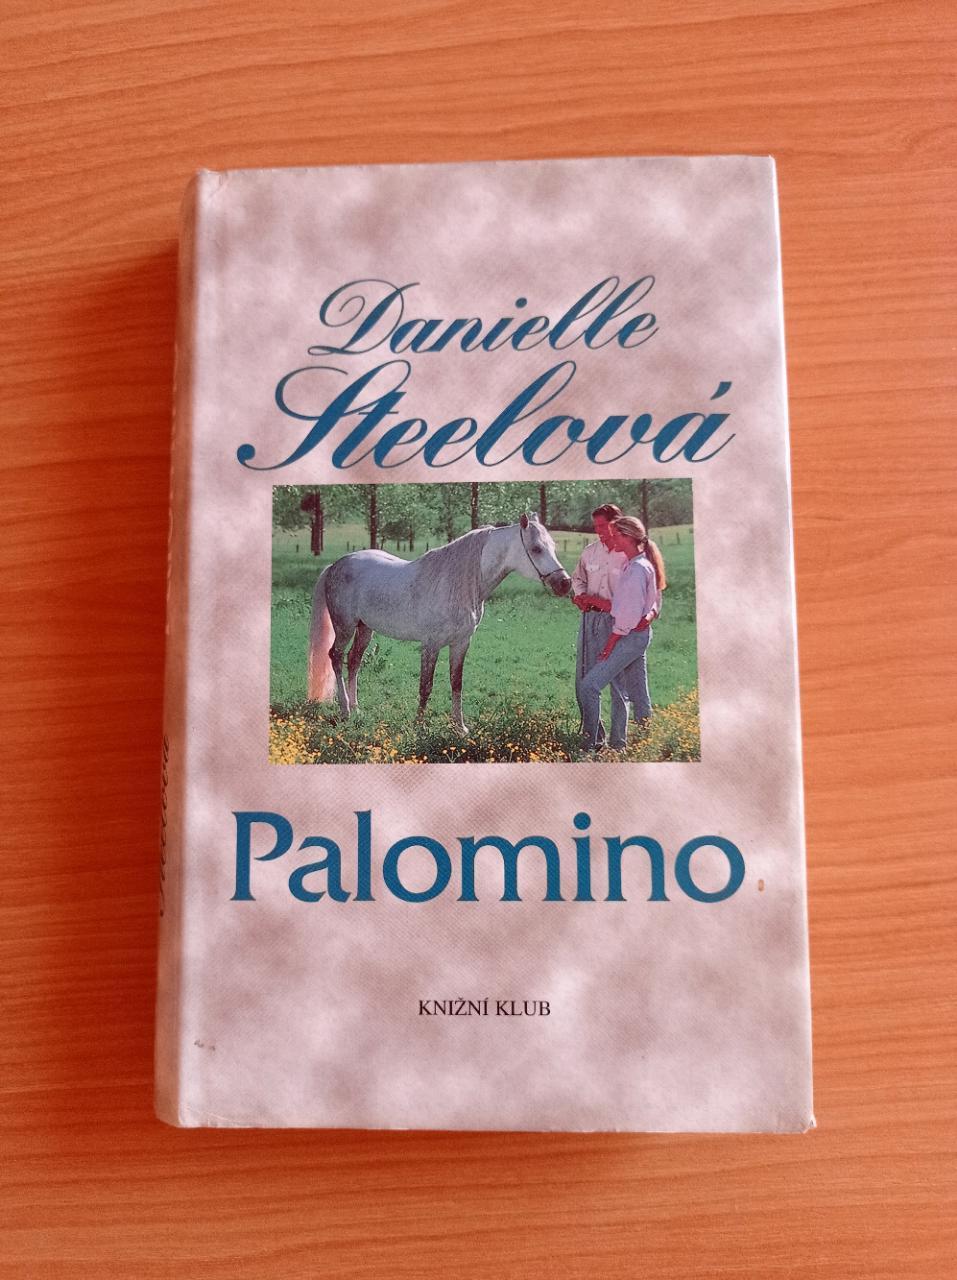 DANIELLE STEELOVÁ - Palomino - foto 1